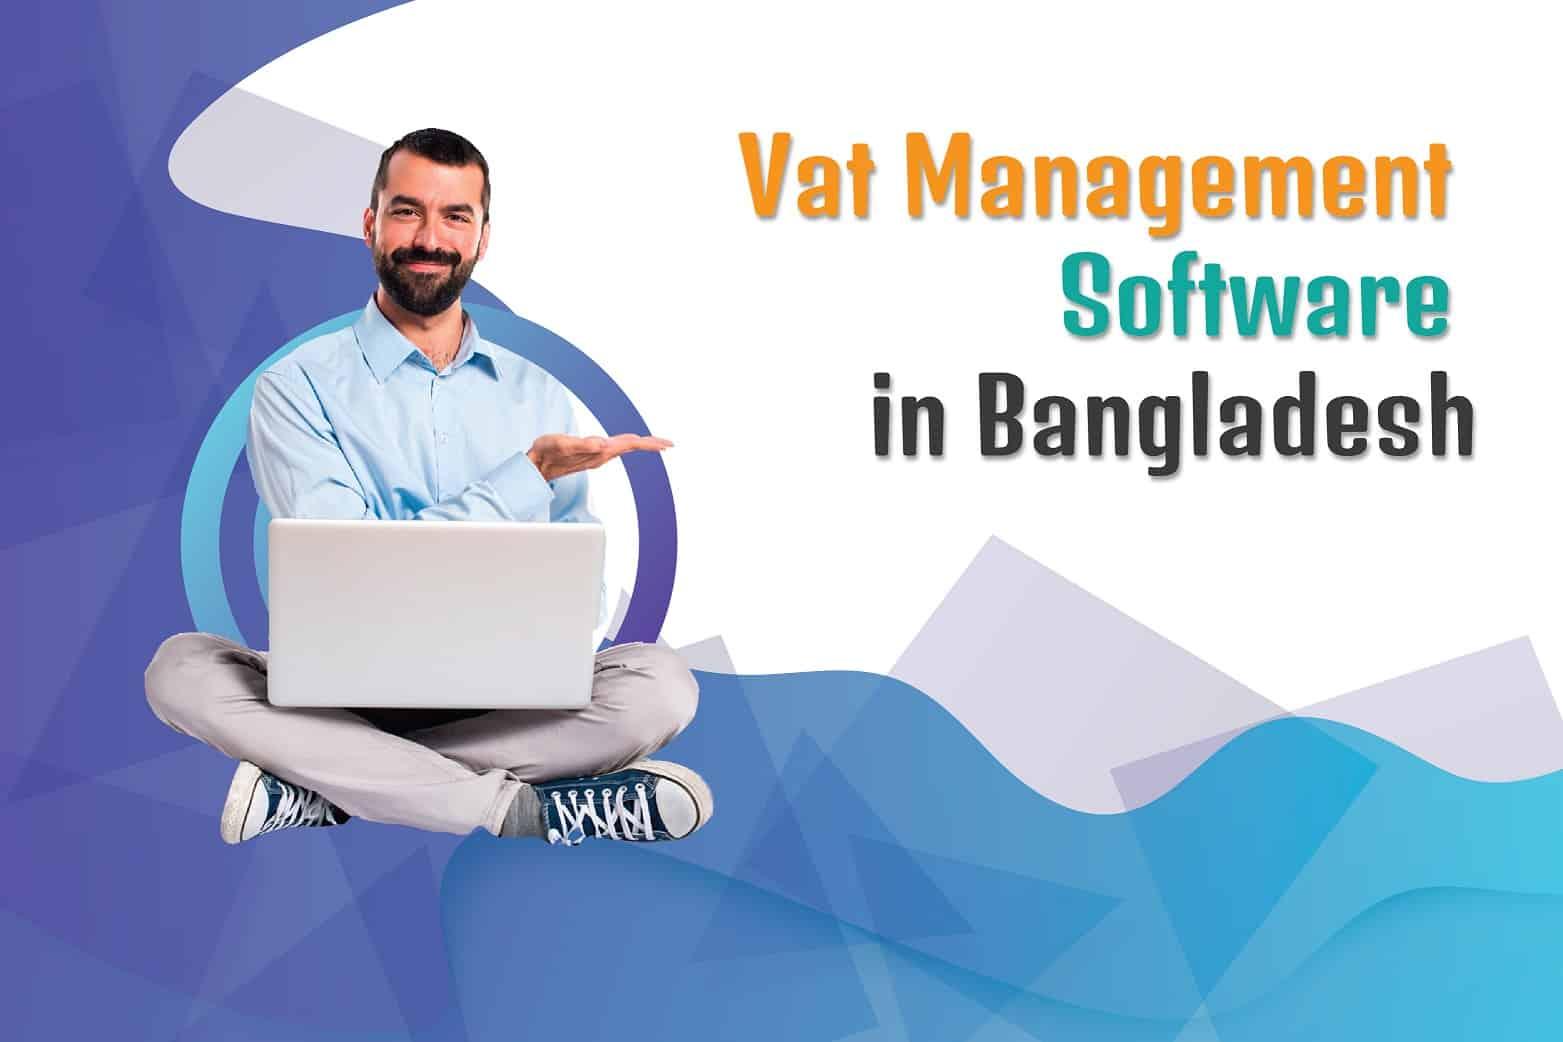 Vat Management Software in Bangladesh